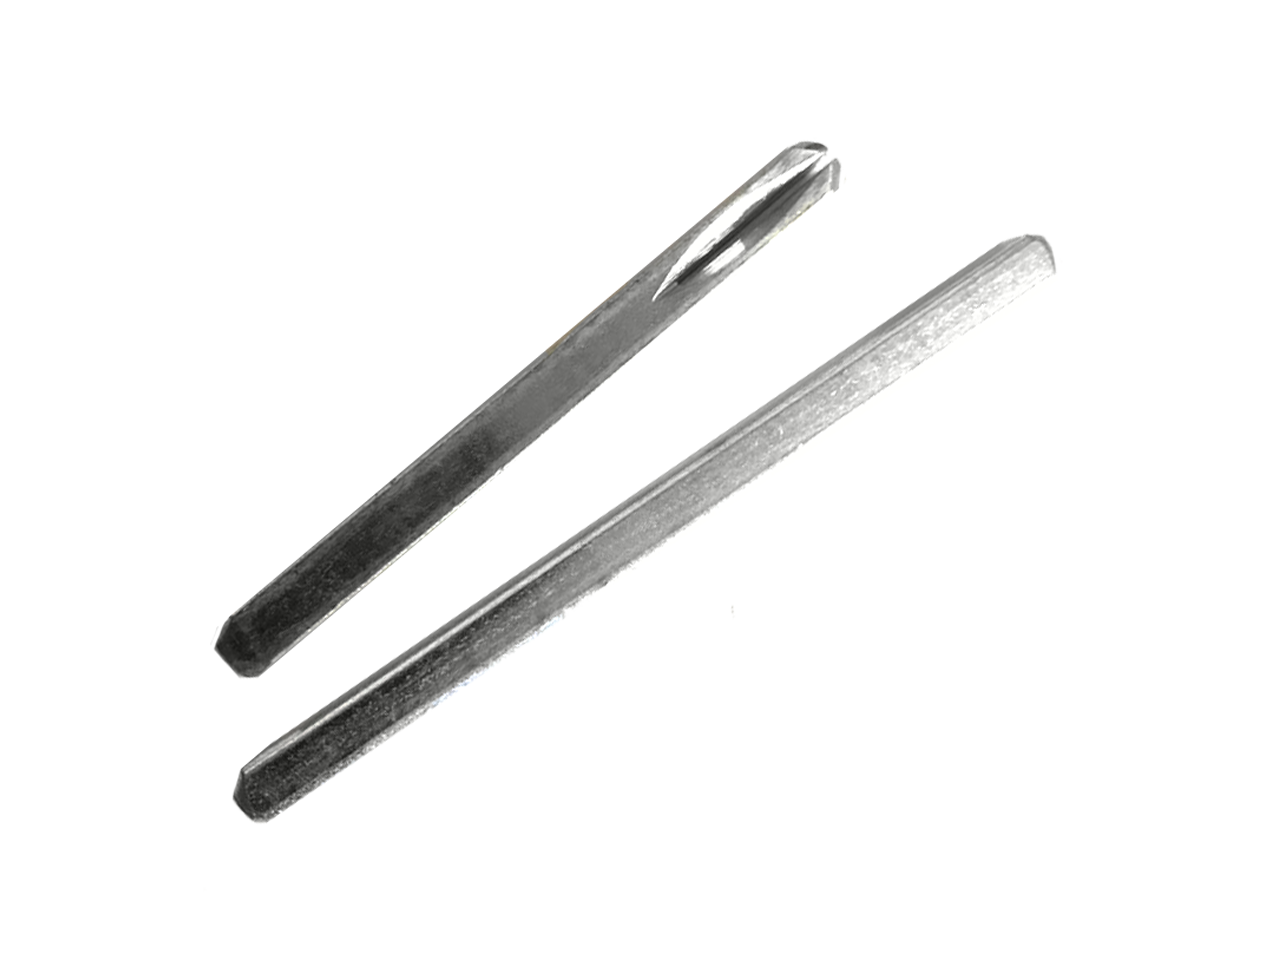 Square rods